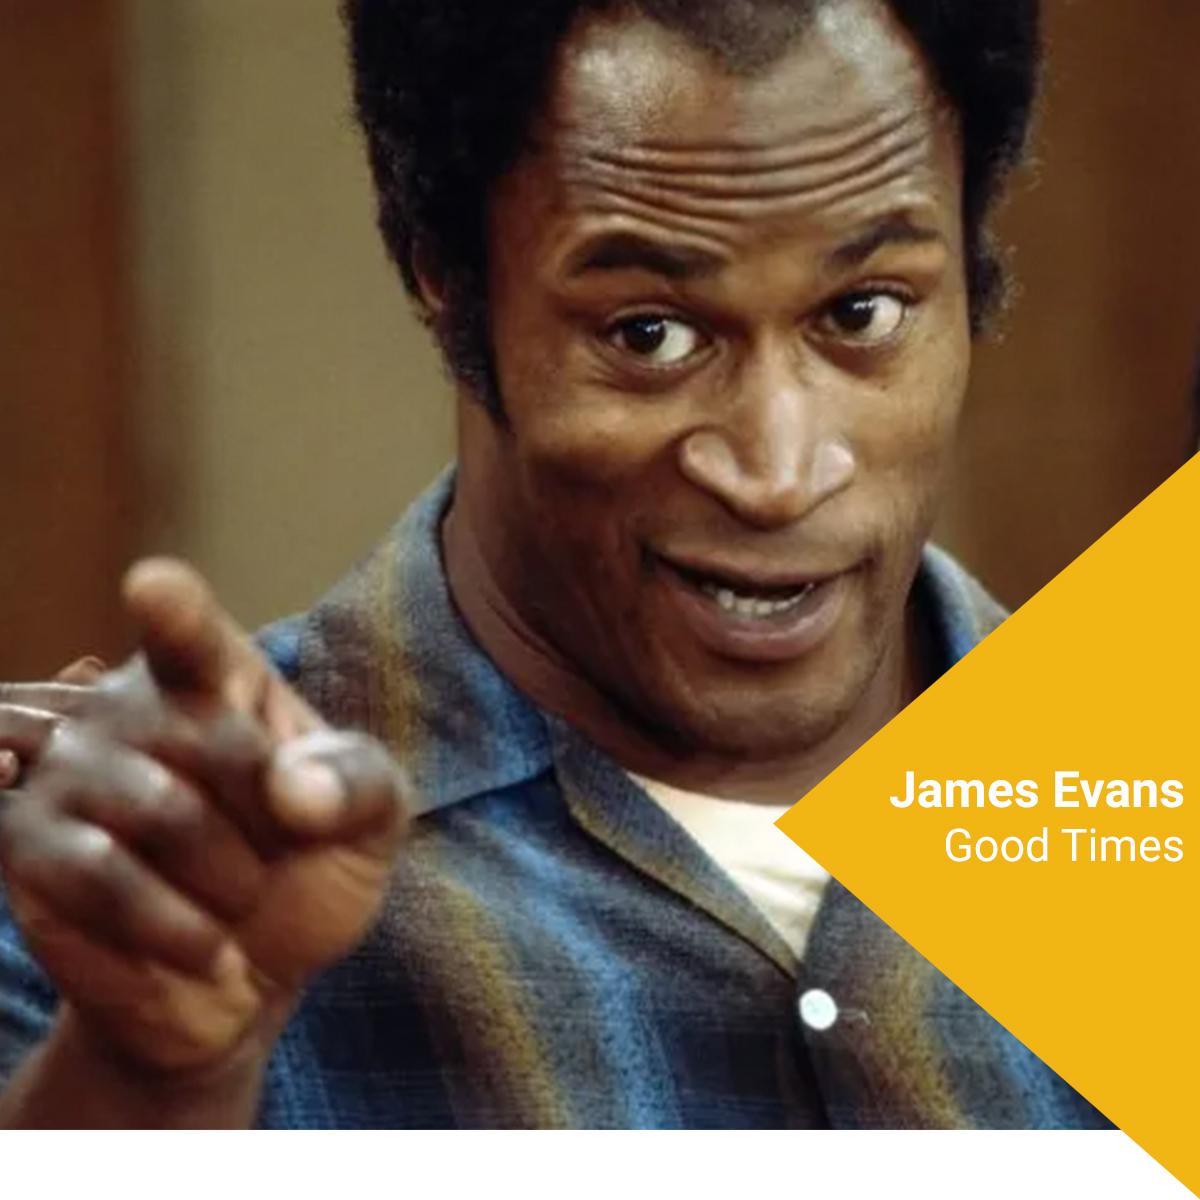 Image of James Evans